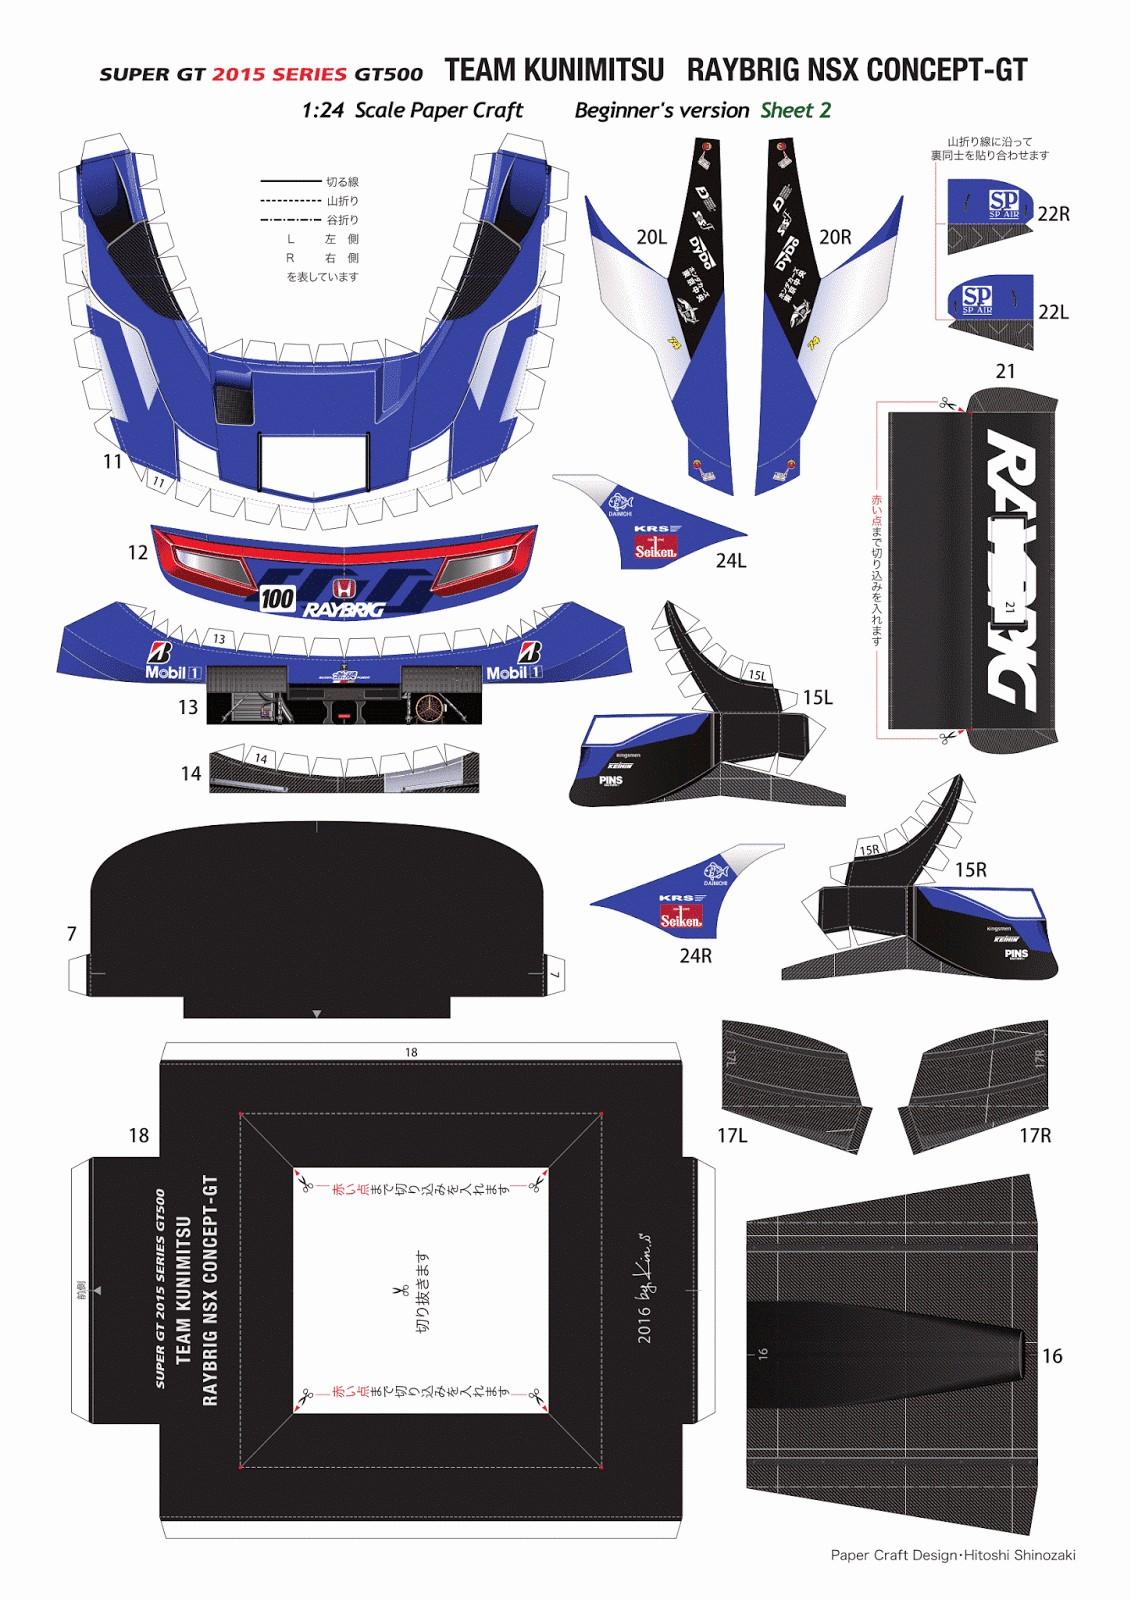 Honda Papercraft 2015 Raybrig Nsx Concept Gt 2 1131—1600